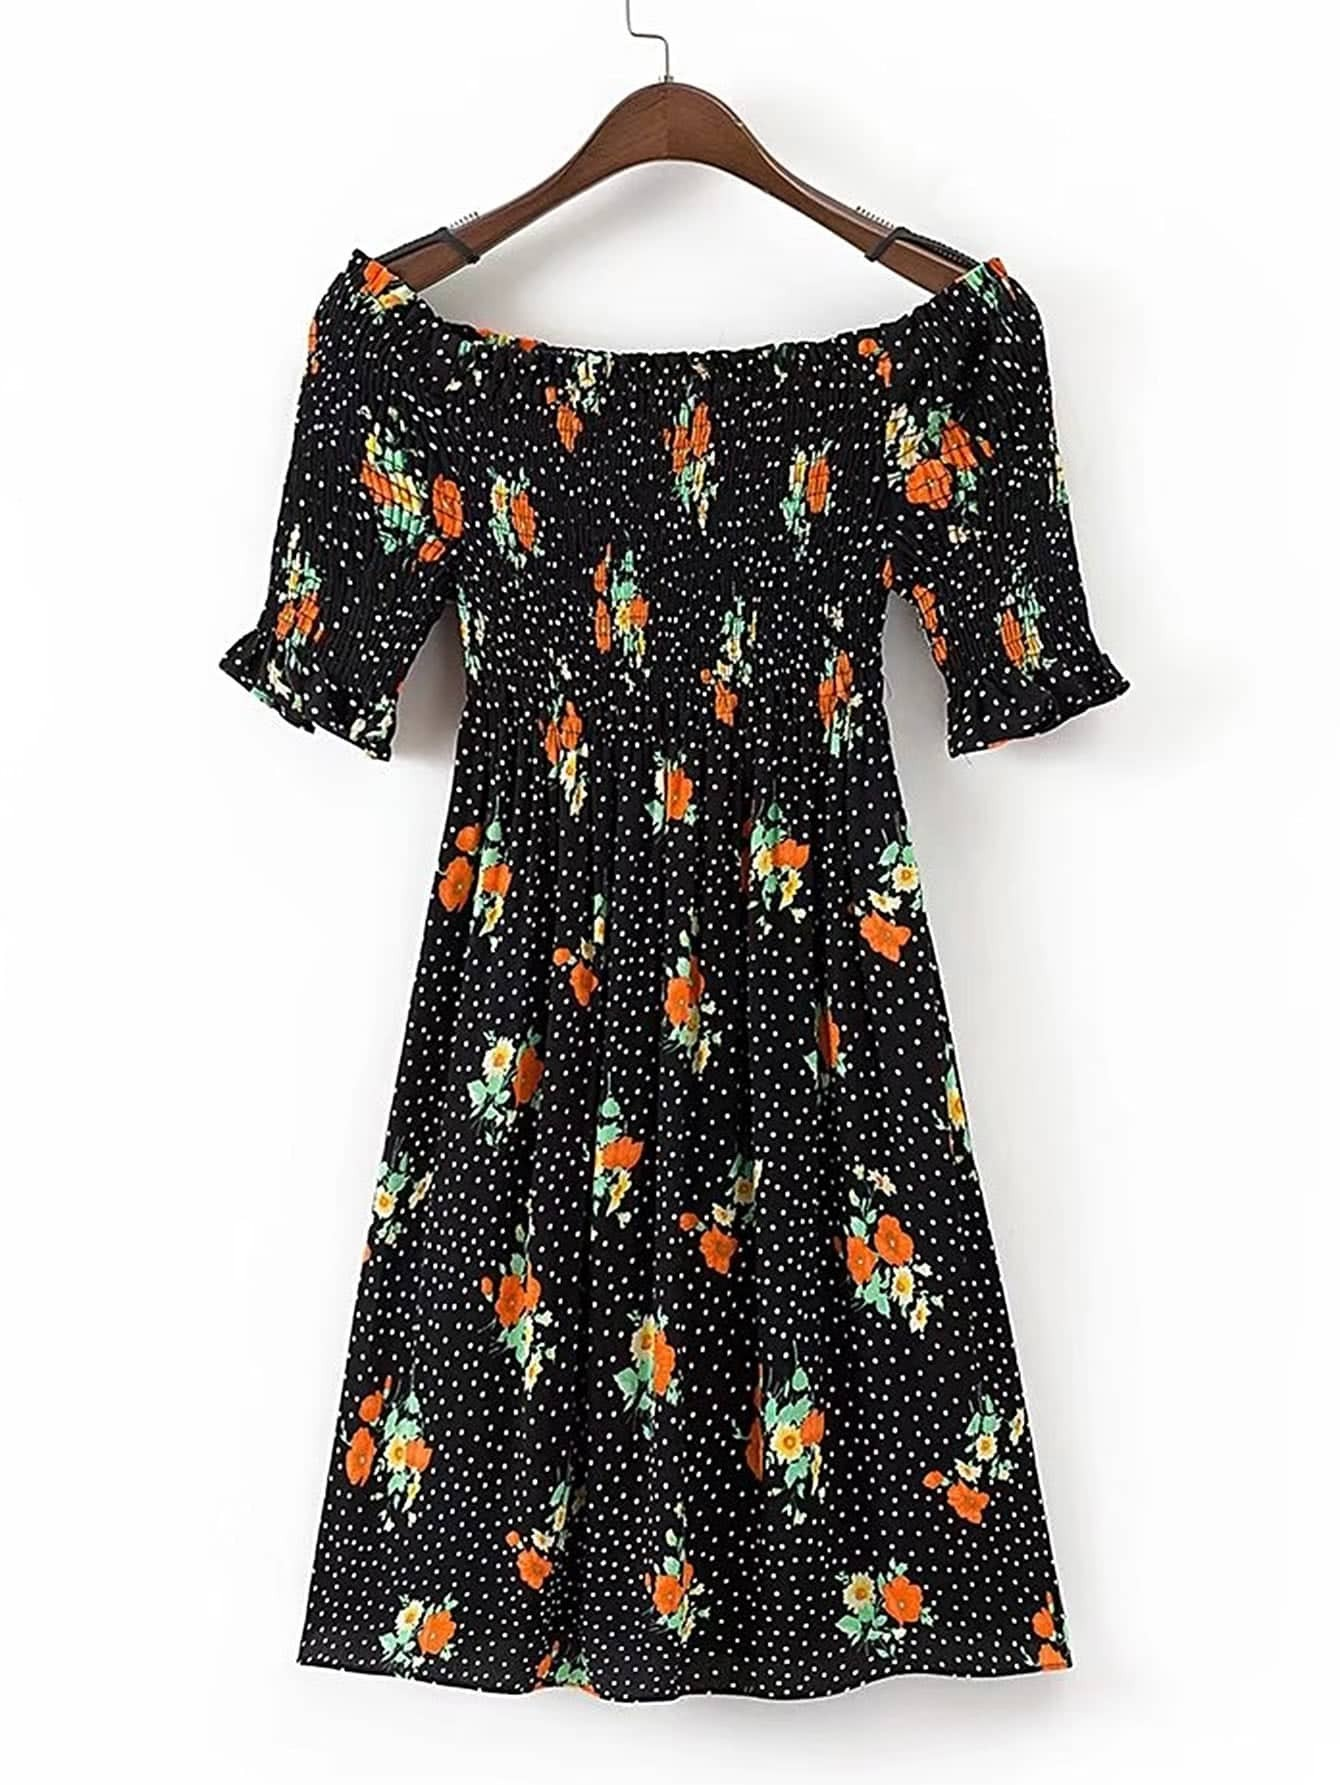 Фото Boat Neckline Shirred Detail Polka Dot Dress. Купить с доставкой